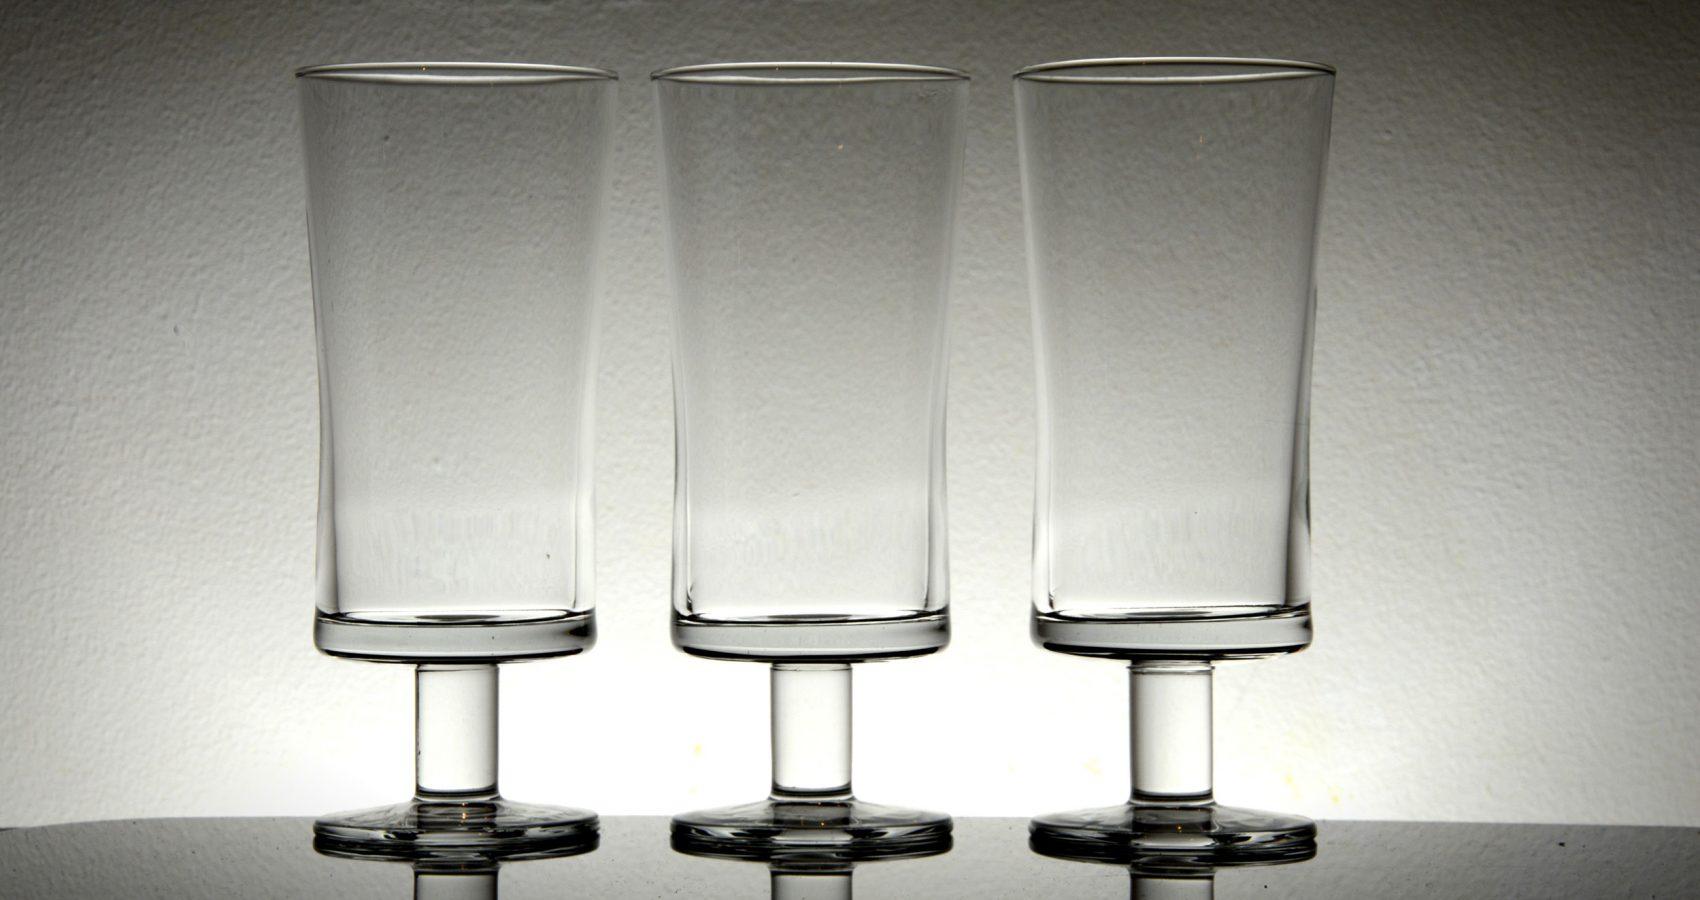 Jak szybko uzależnia alkohol?